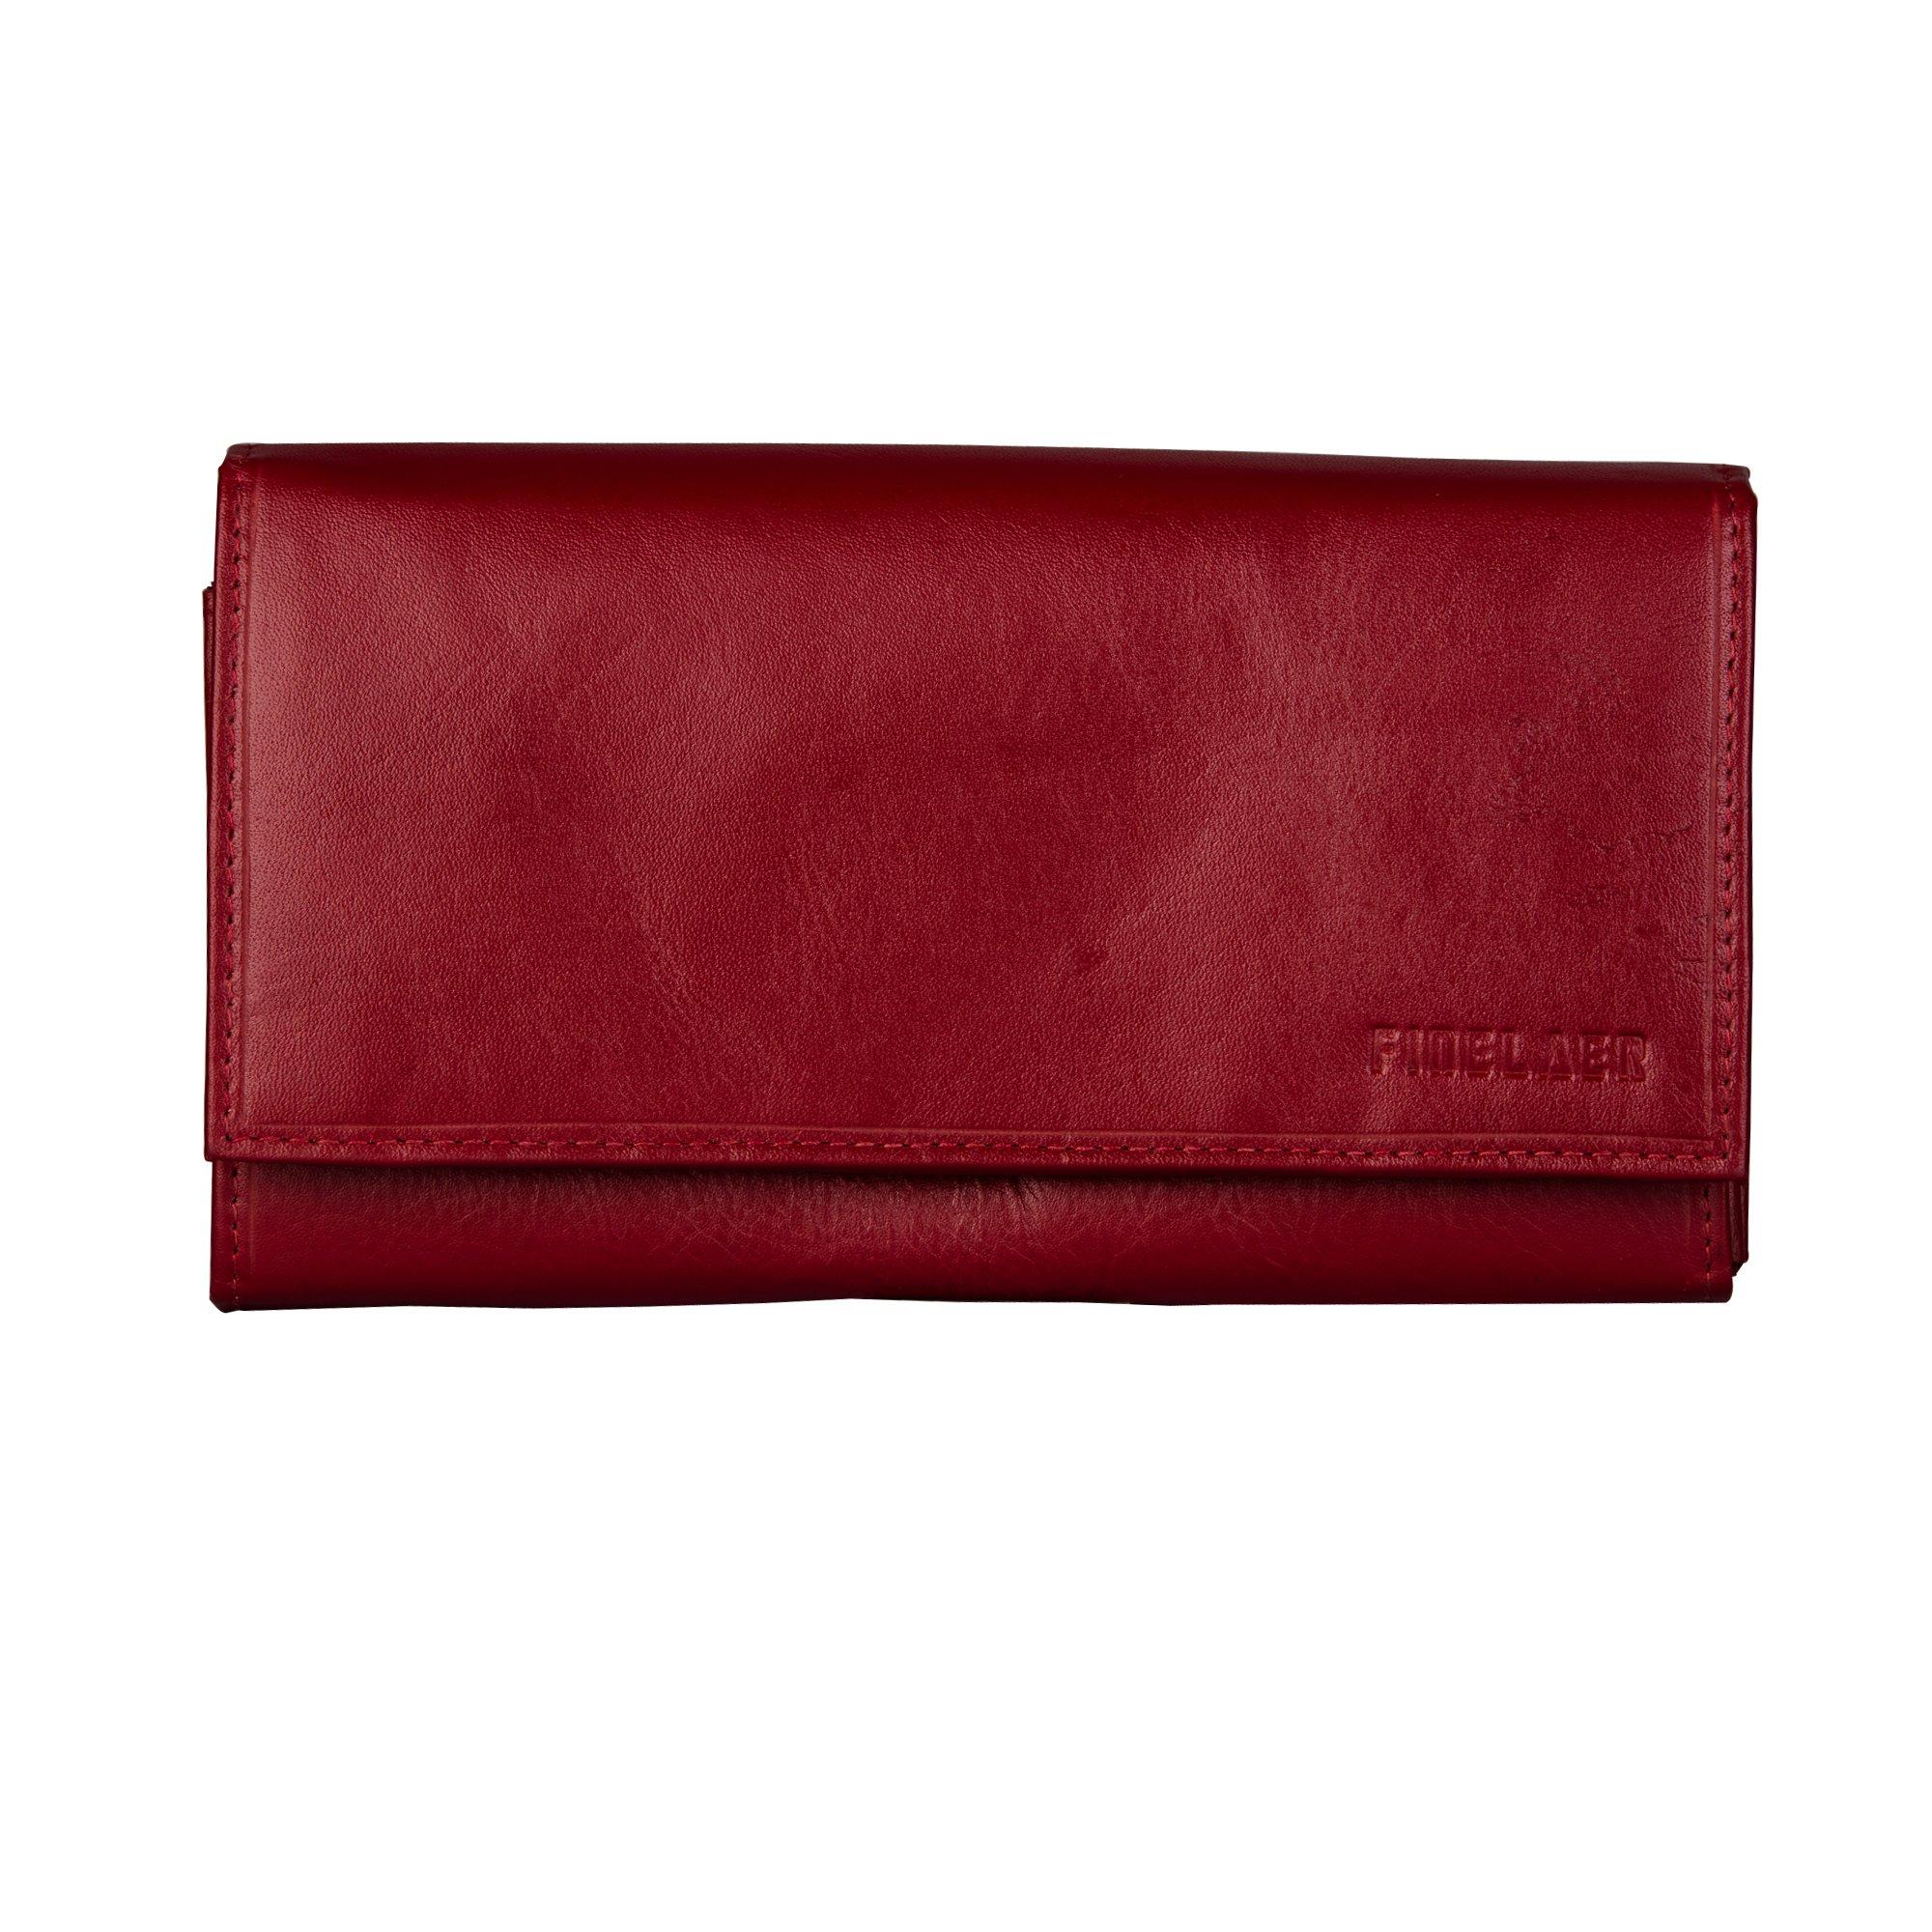 Women Leather Clutch Purse Envelope Wallet Red Bag Snap On 1 ID 5 Card 6 Cash Slots | Finelaer